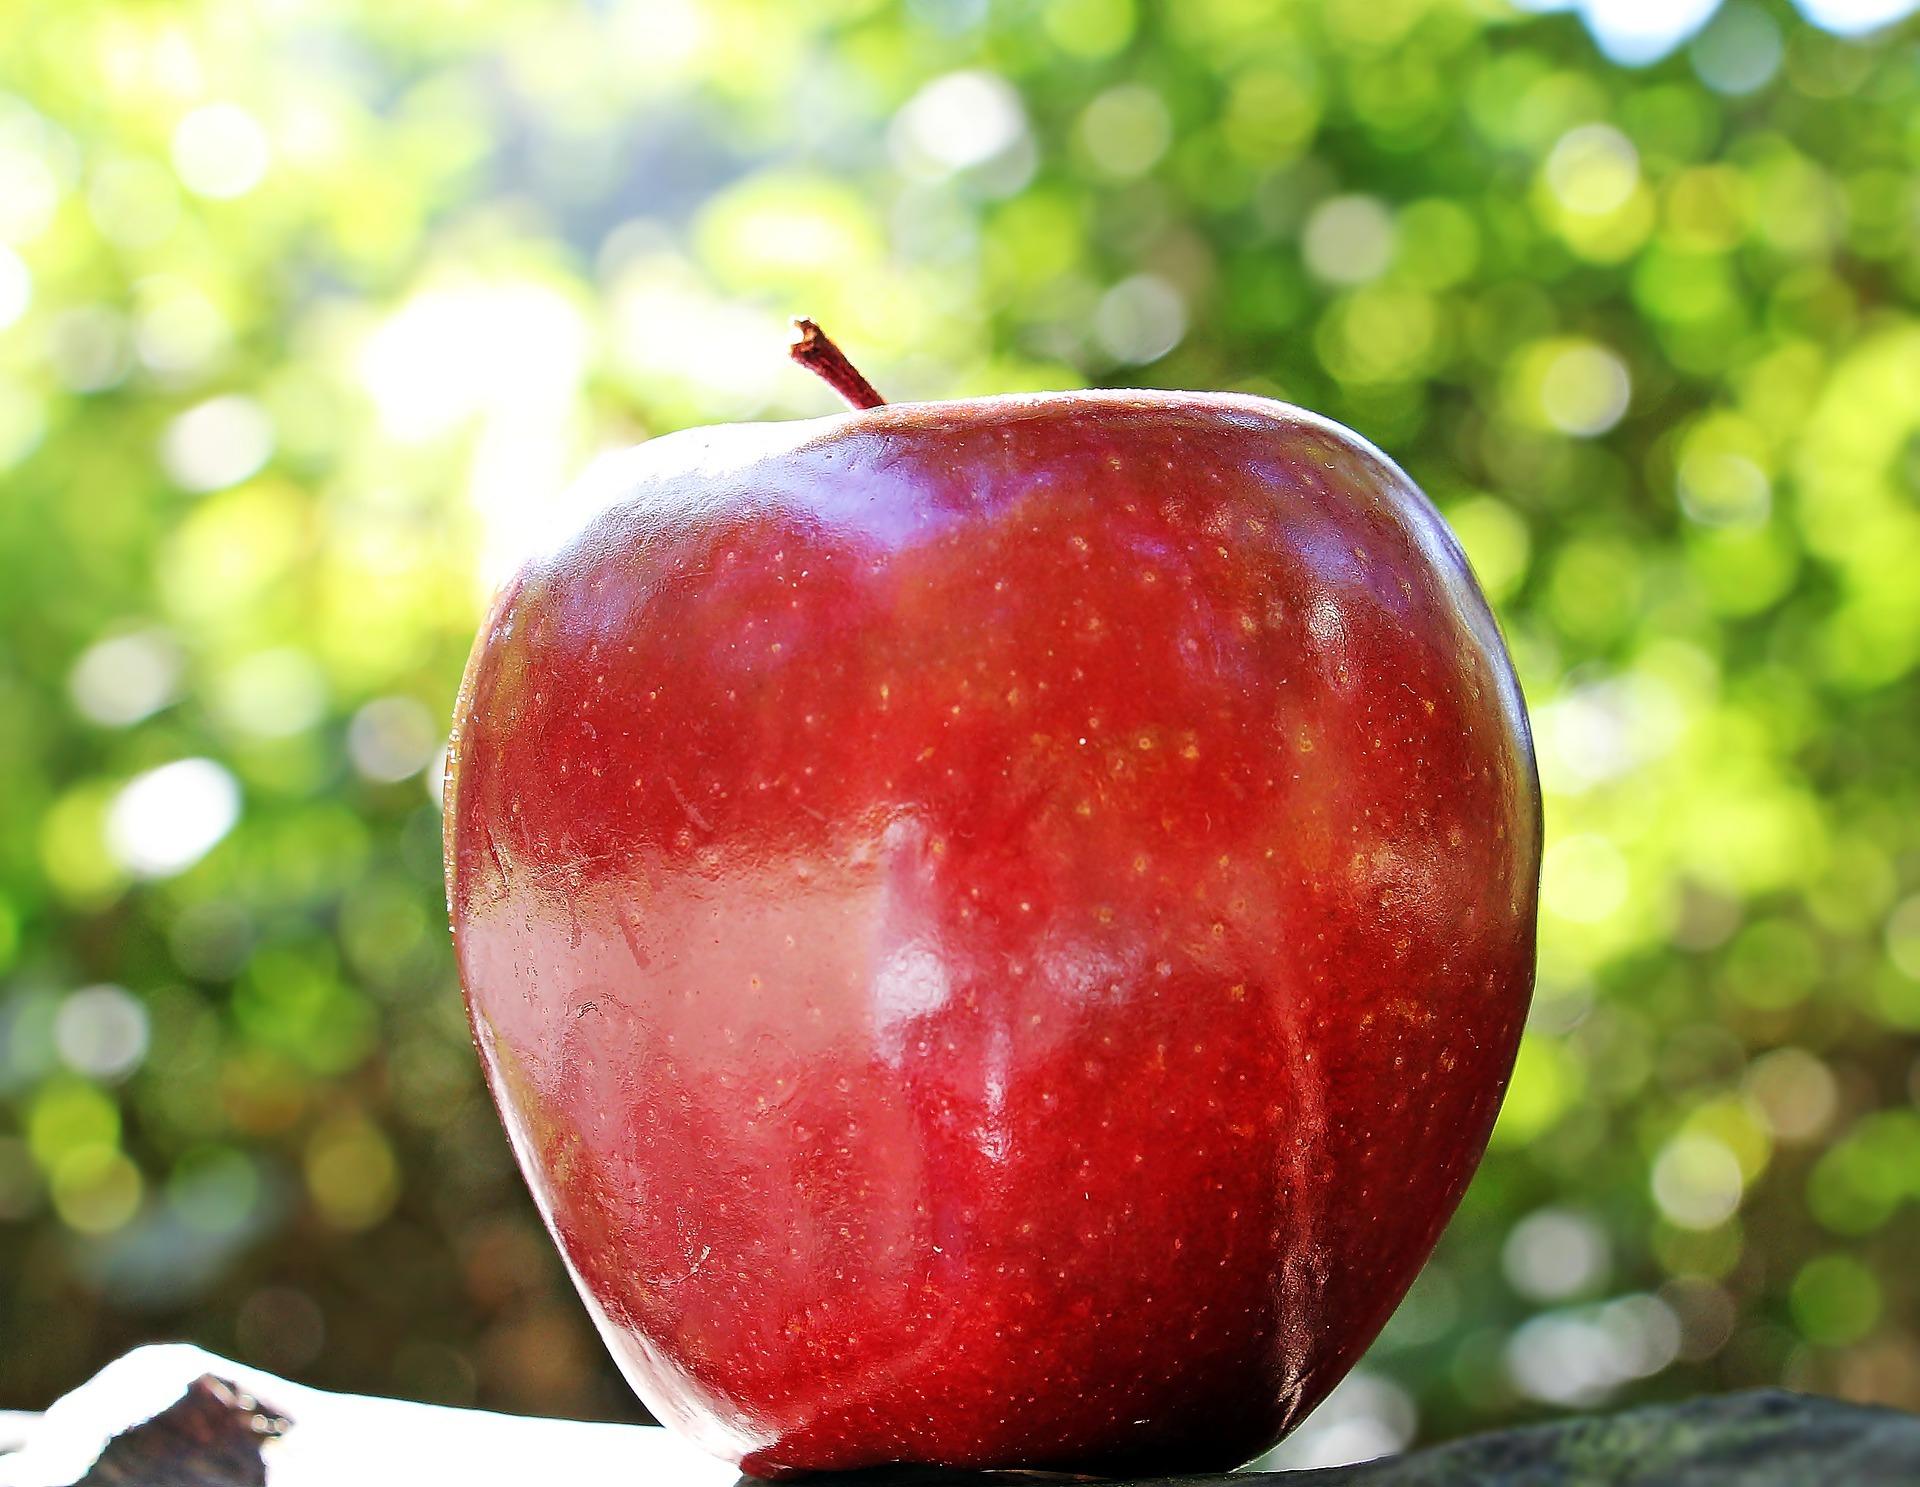 apple-1702316_1920.jpg